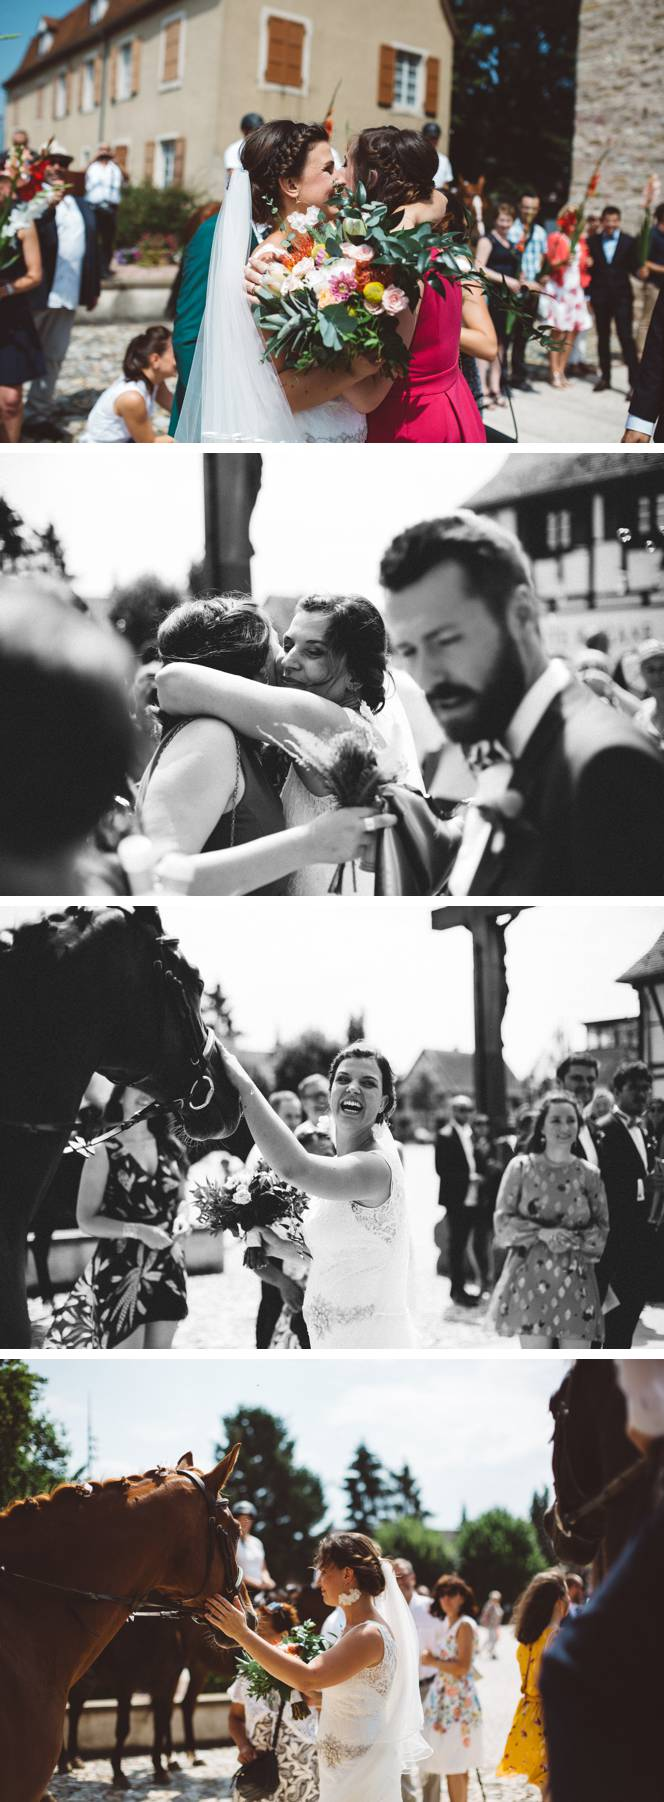 mariage-tropical-raben-horben_0015.jpg